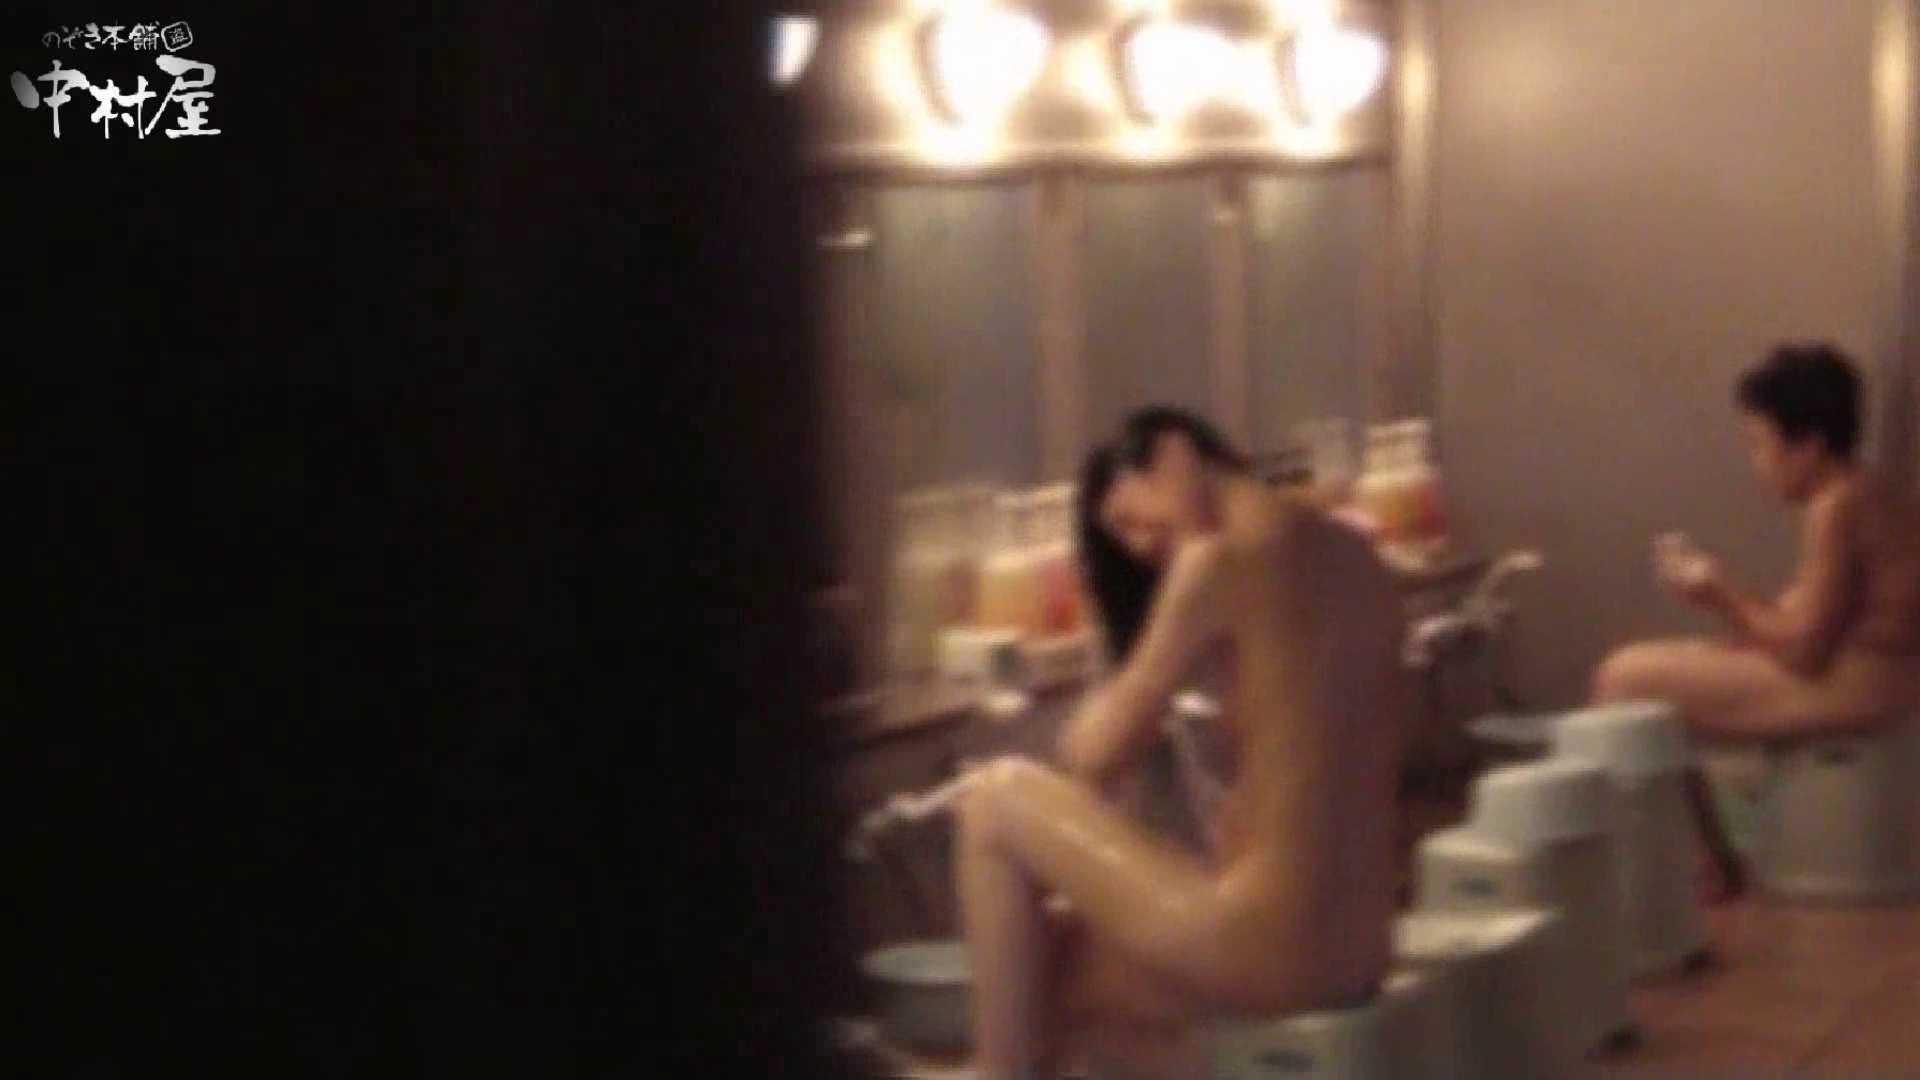 民家風呂専門盗撮師の超危険映像 vol.009 民家シリーズ  90PIX 55